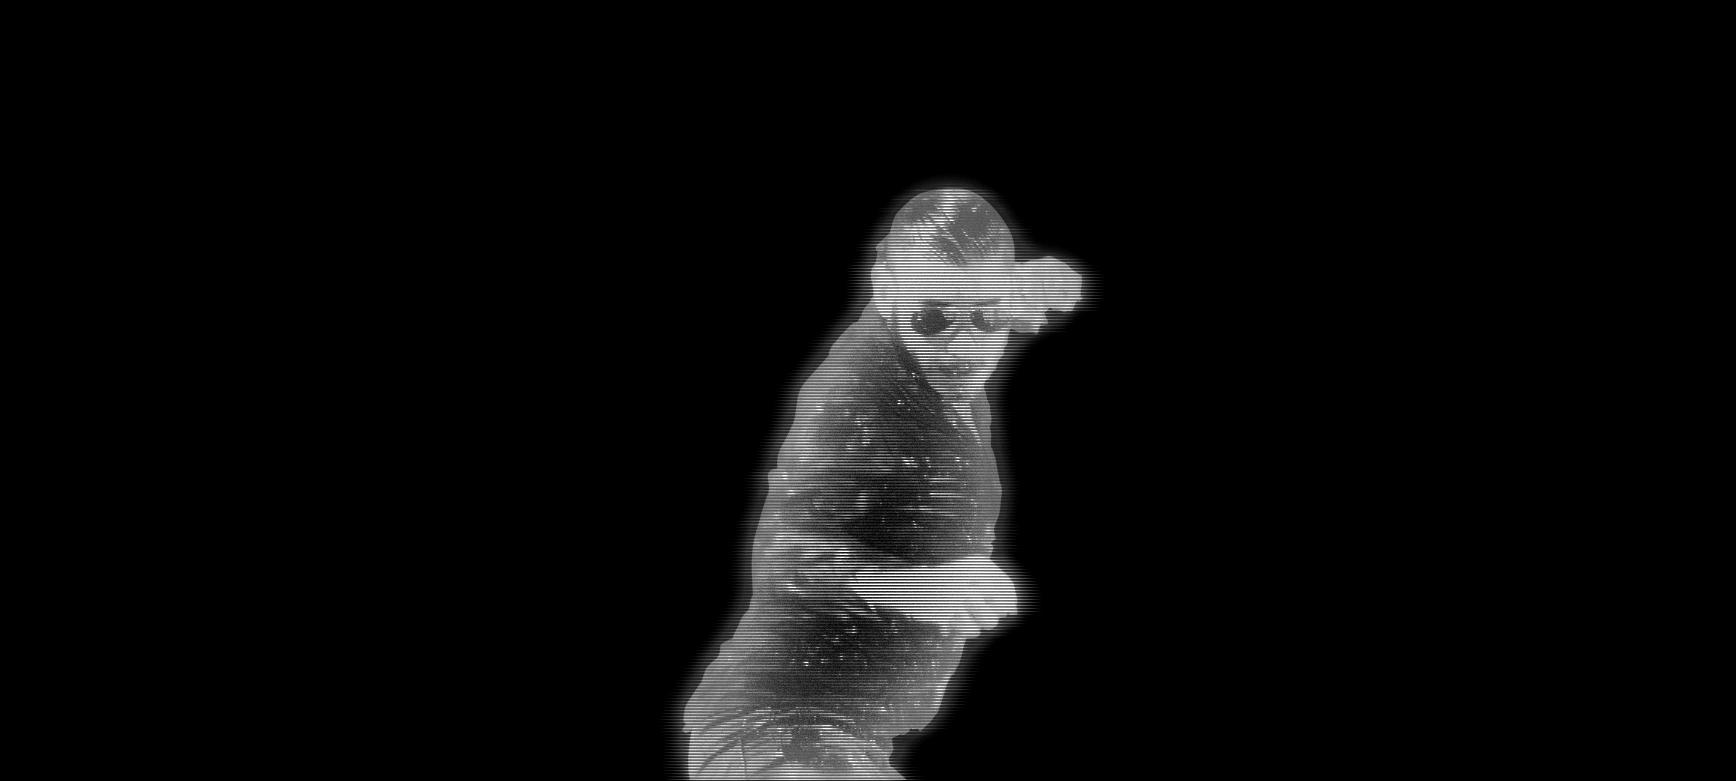 DEO 63 HOLOGRAMA ulises